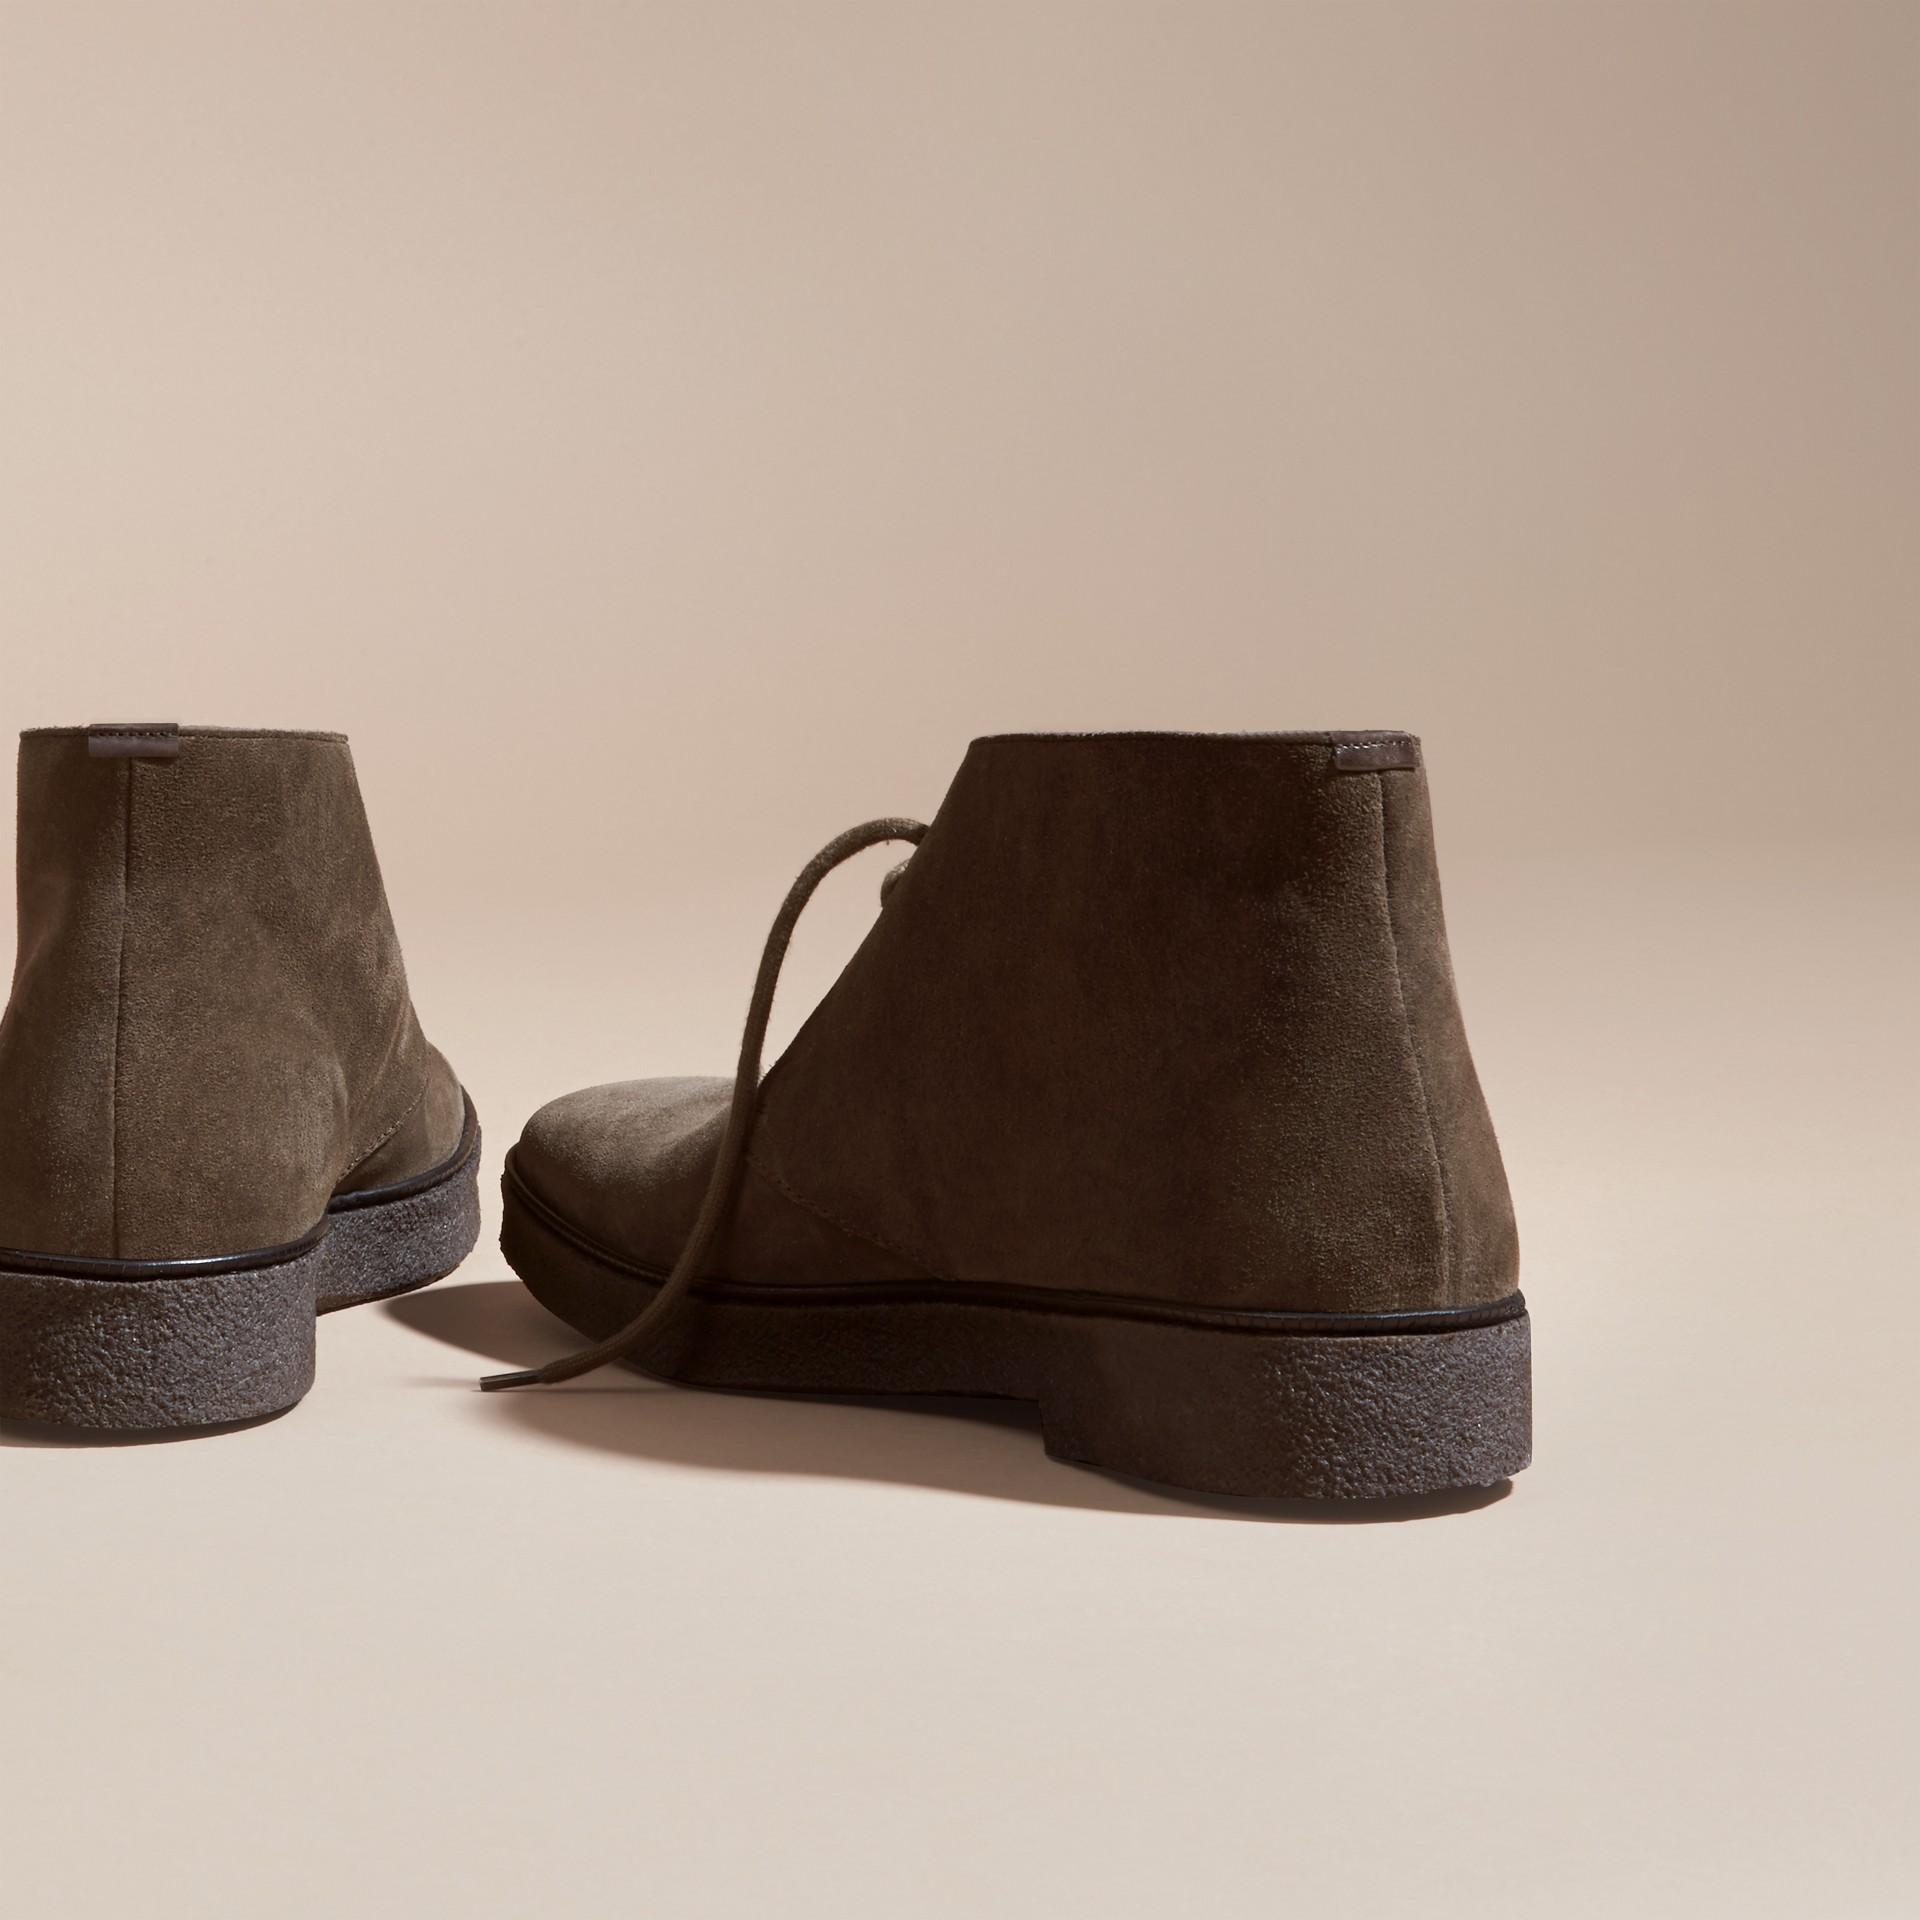 Kaki Bottines chukka en cuir velours avec semelles en crêpe Kaki - photo de la galerie 4